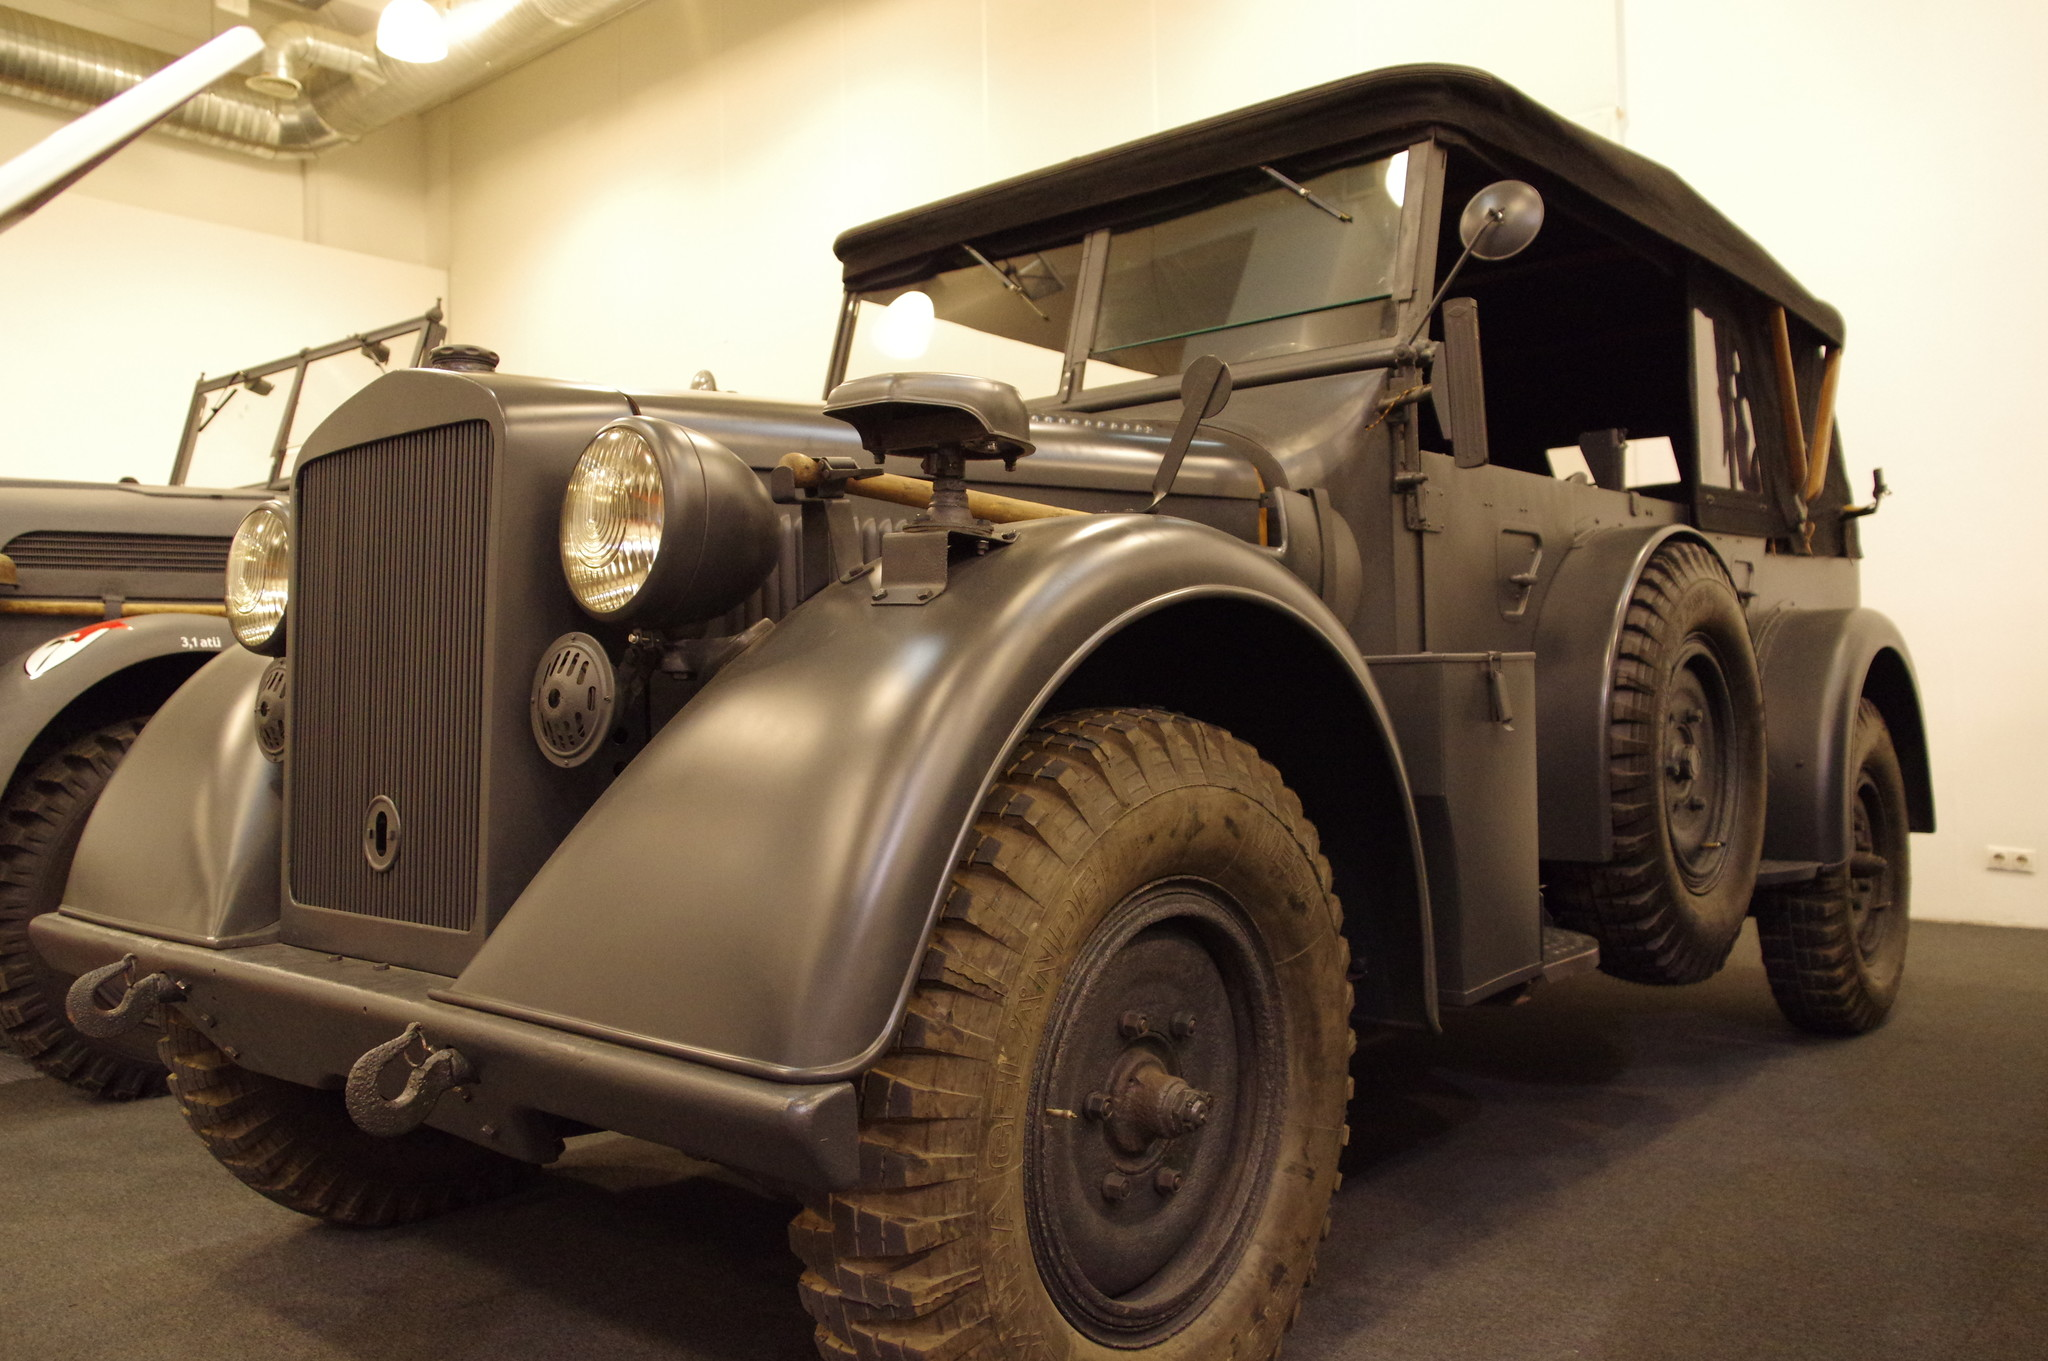 Автомобиль m. PKW Kfz 15 Horch 901 1938 года выпуска